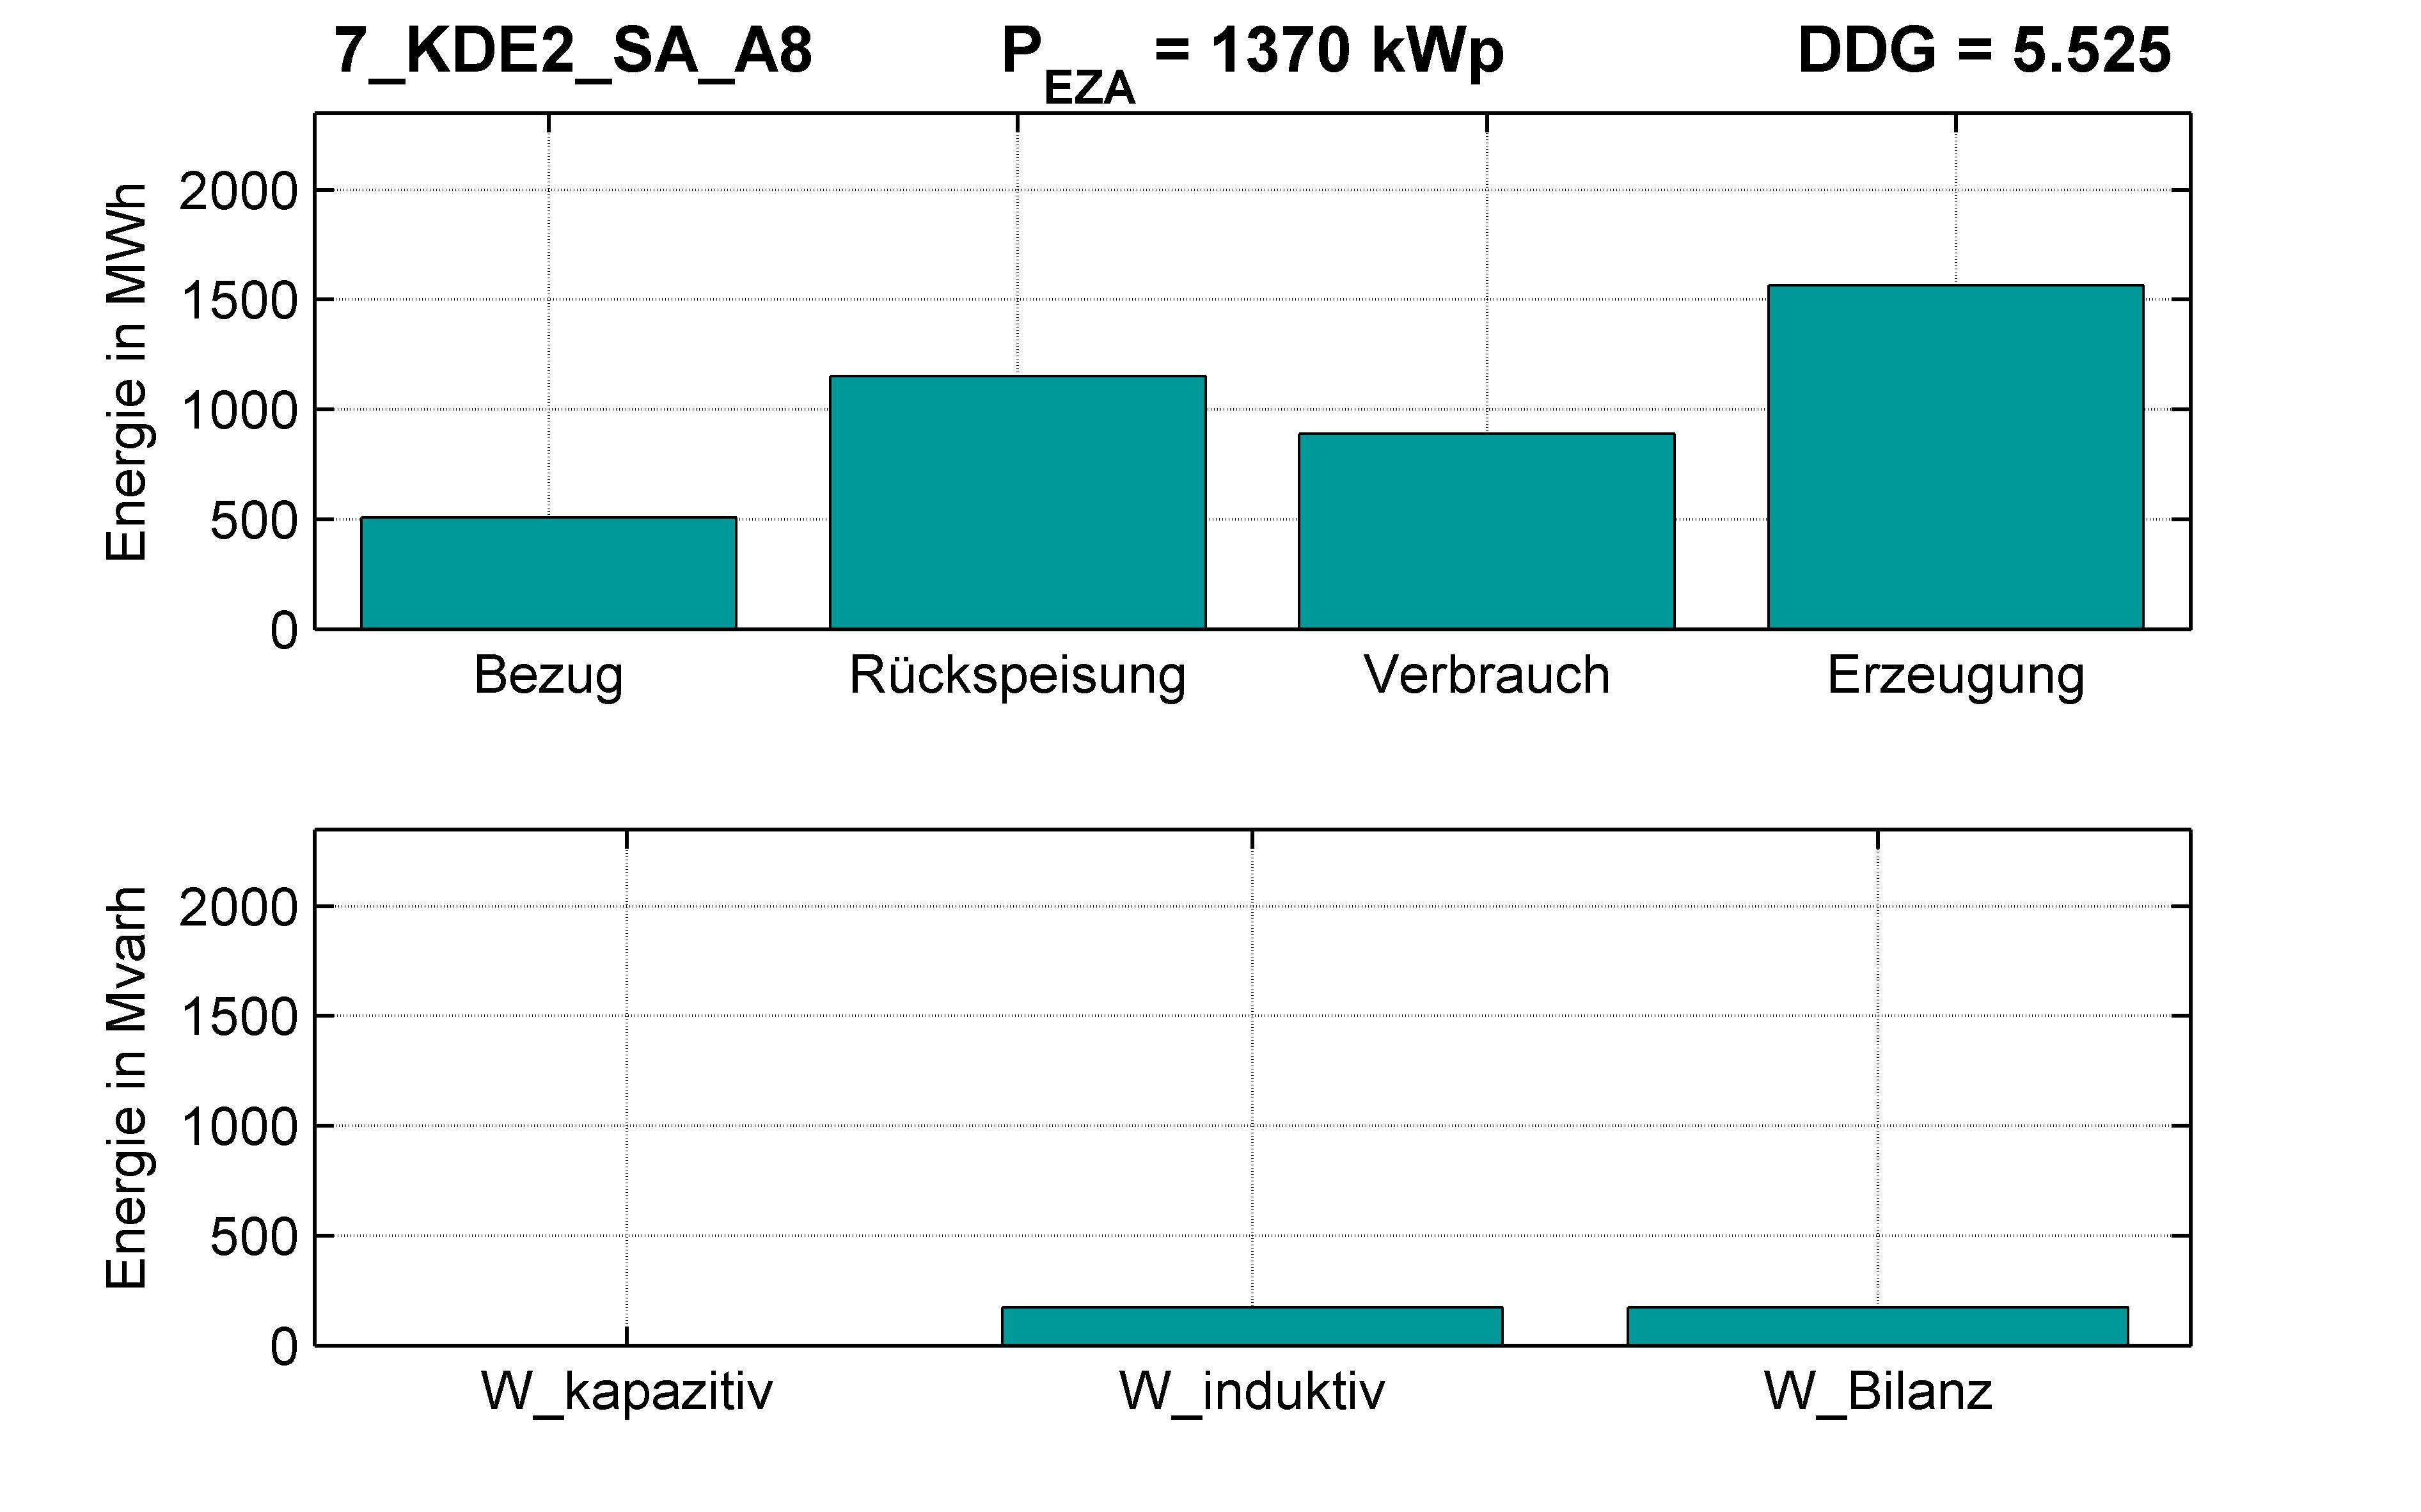 KDE2 | Längsregler (SA) A8 | PQ-Bilanz